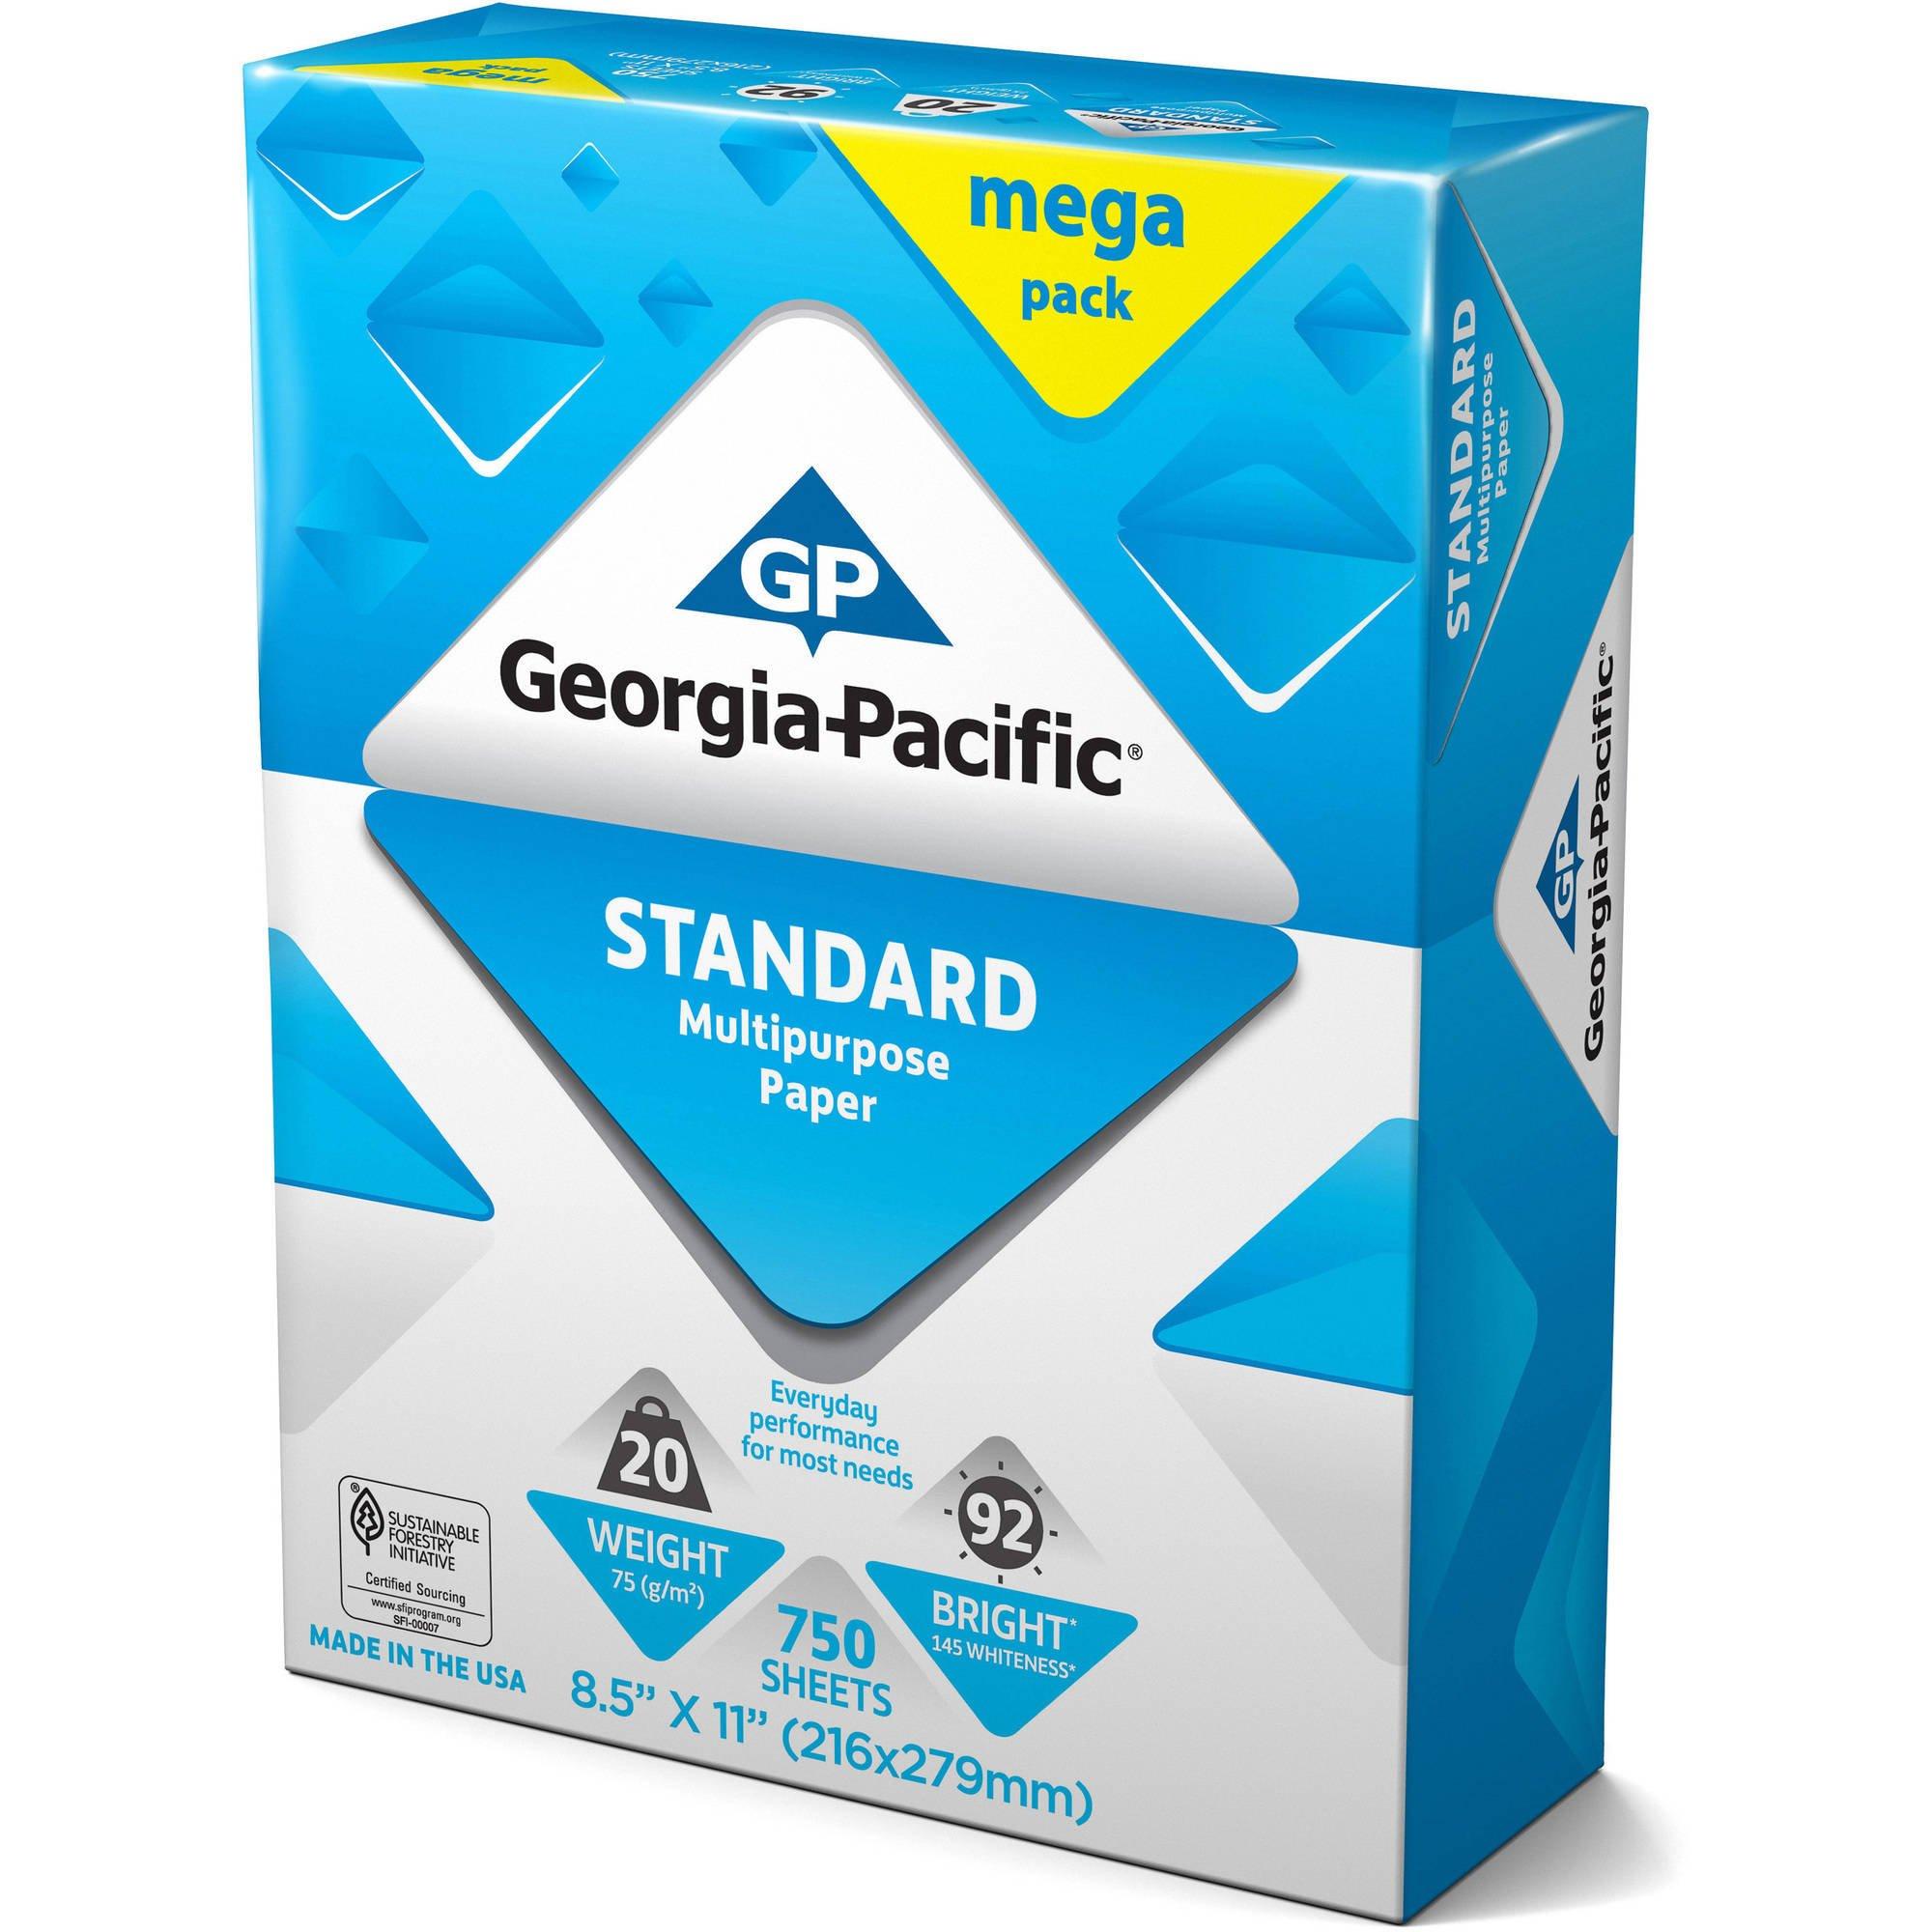 Georgia-Pacific Standard Multipurpose Paper, 8.5'' x 11'', 20 lb, 92 Brightness, 750 Sheets